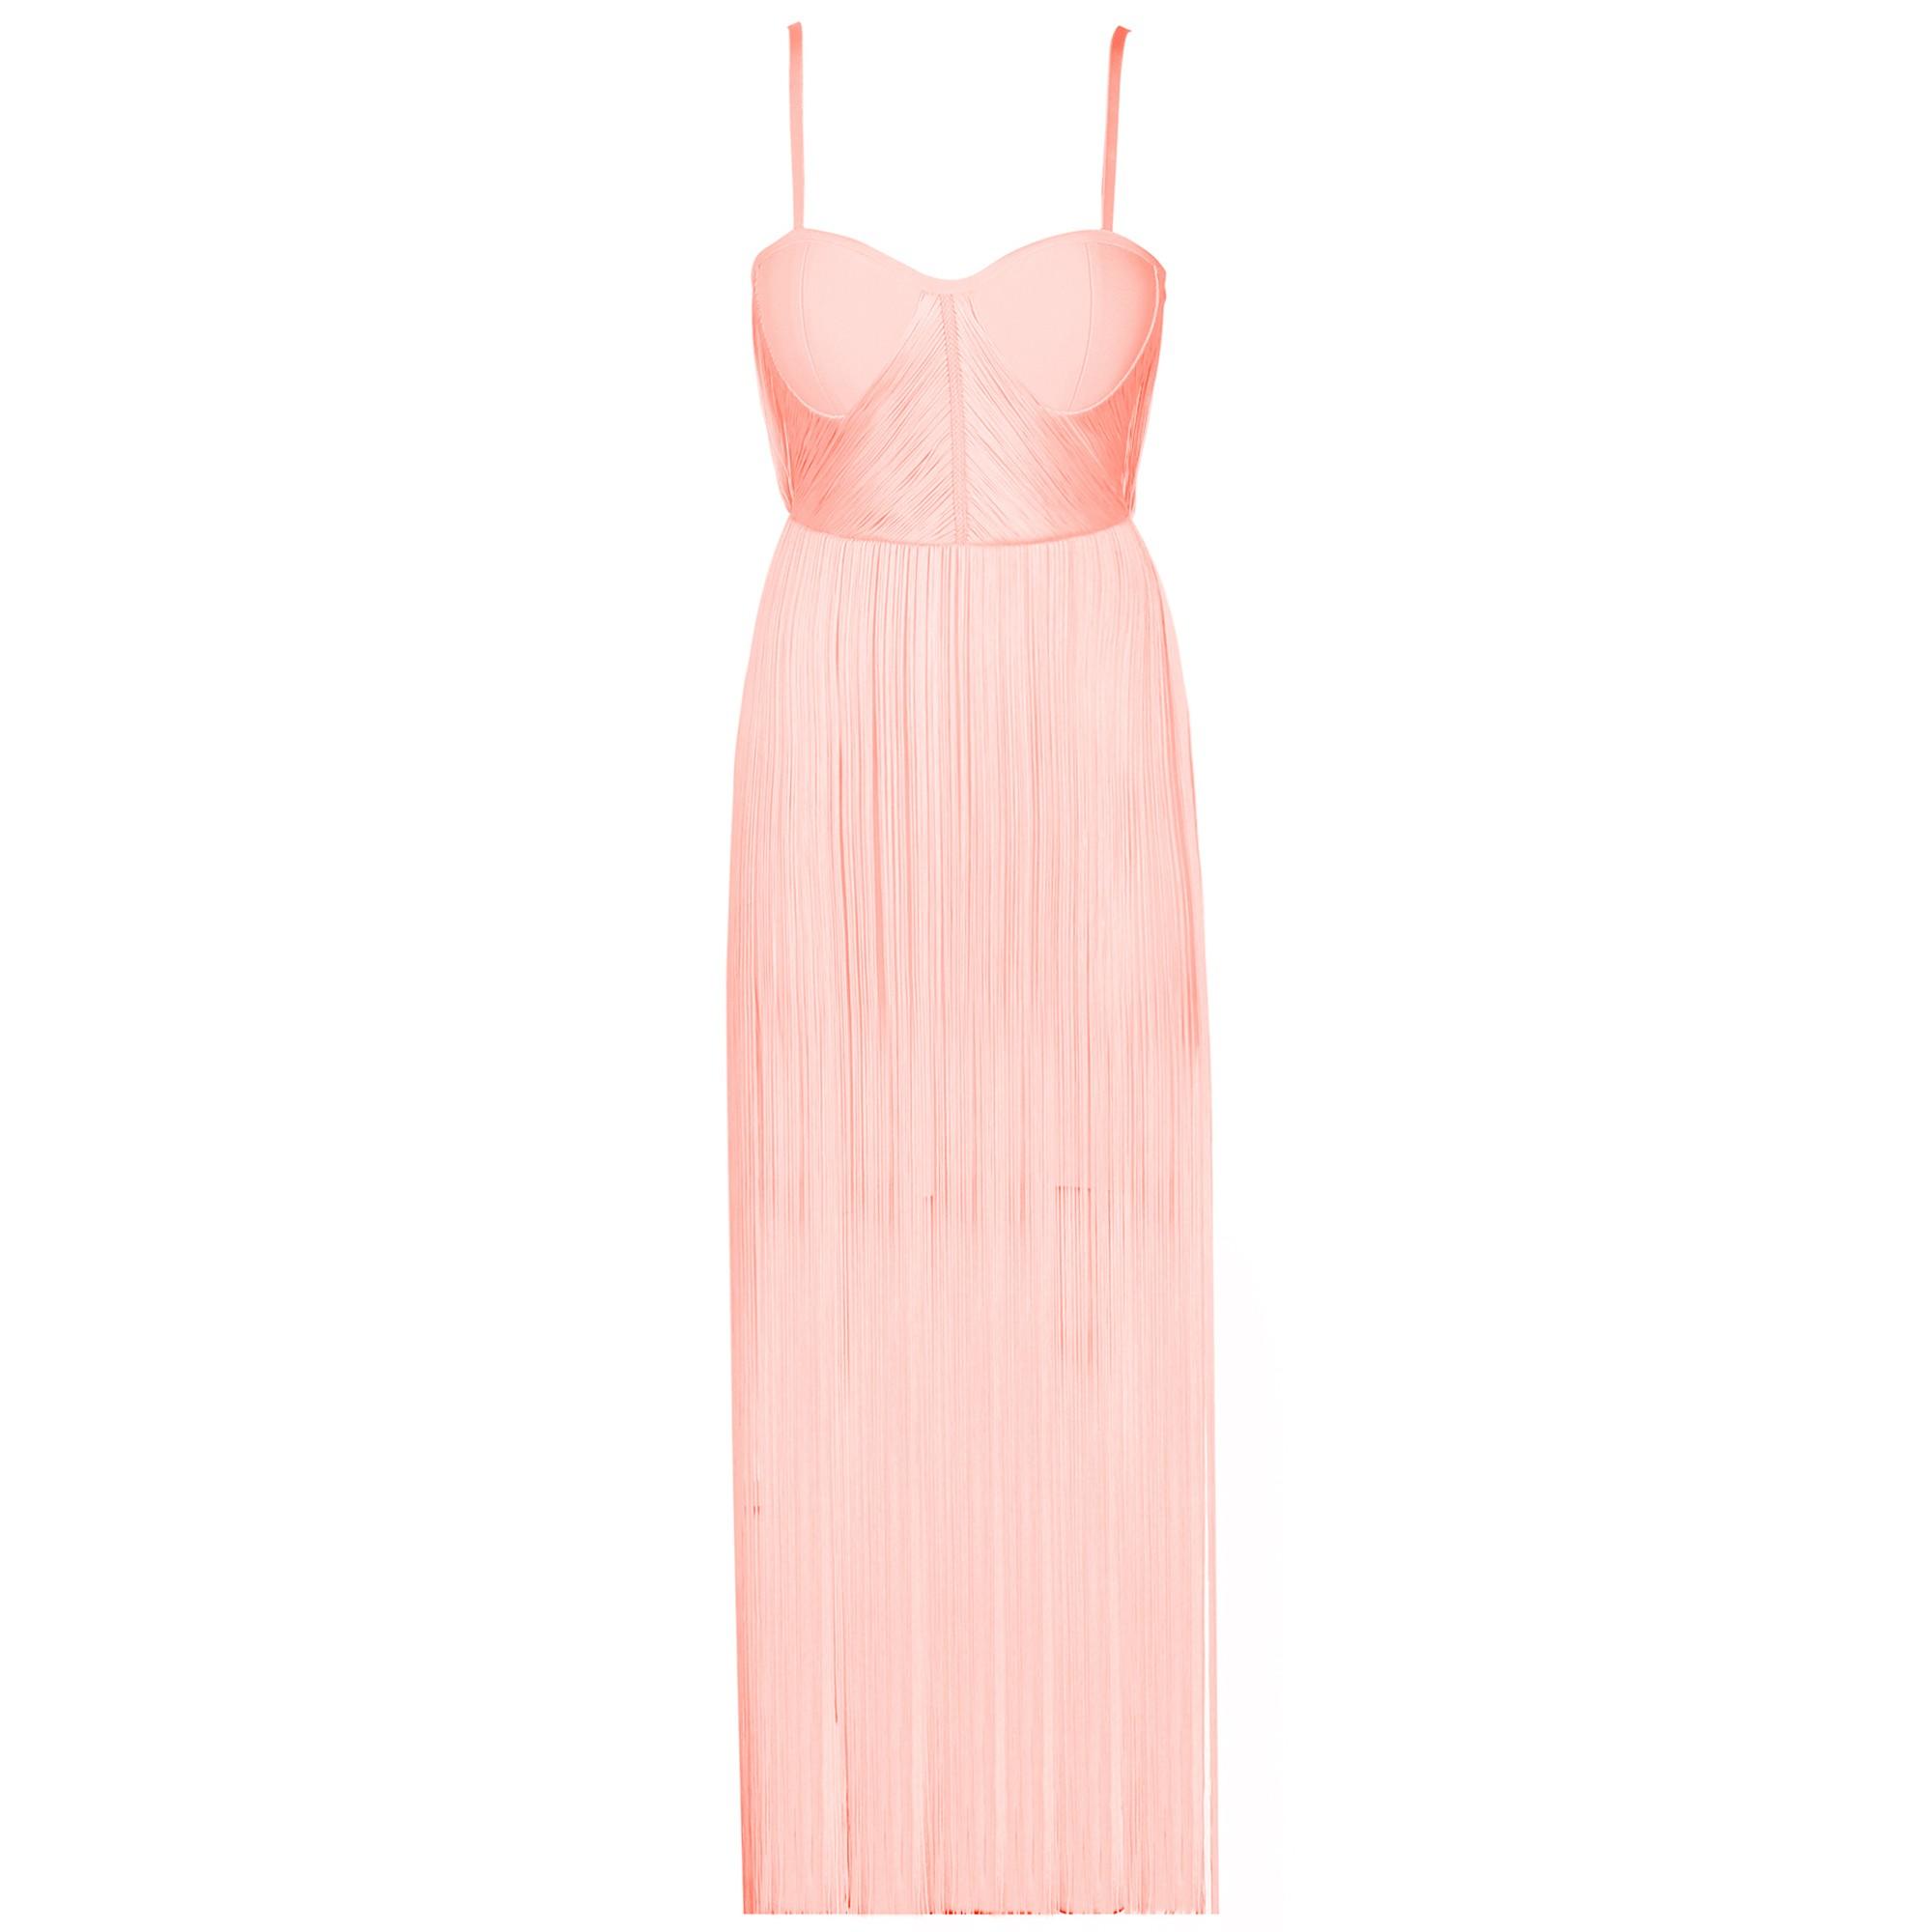 Rayon - Pink Strapy Sleeveless Maxi Tassel Evening Bandage Dress HJ518-Pink